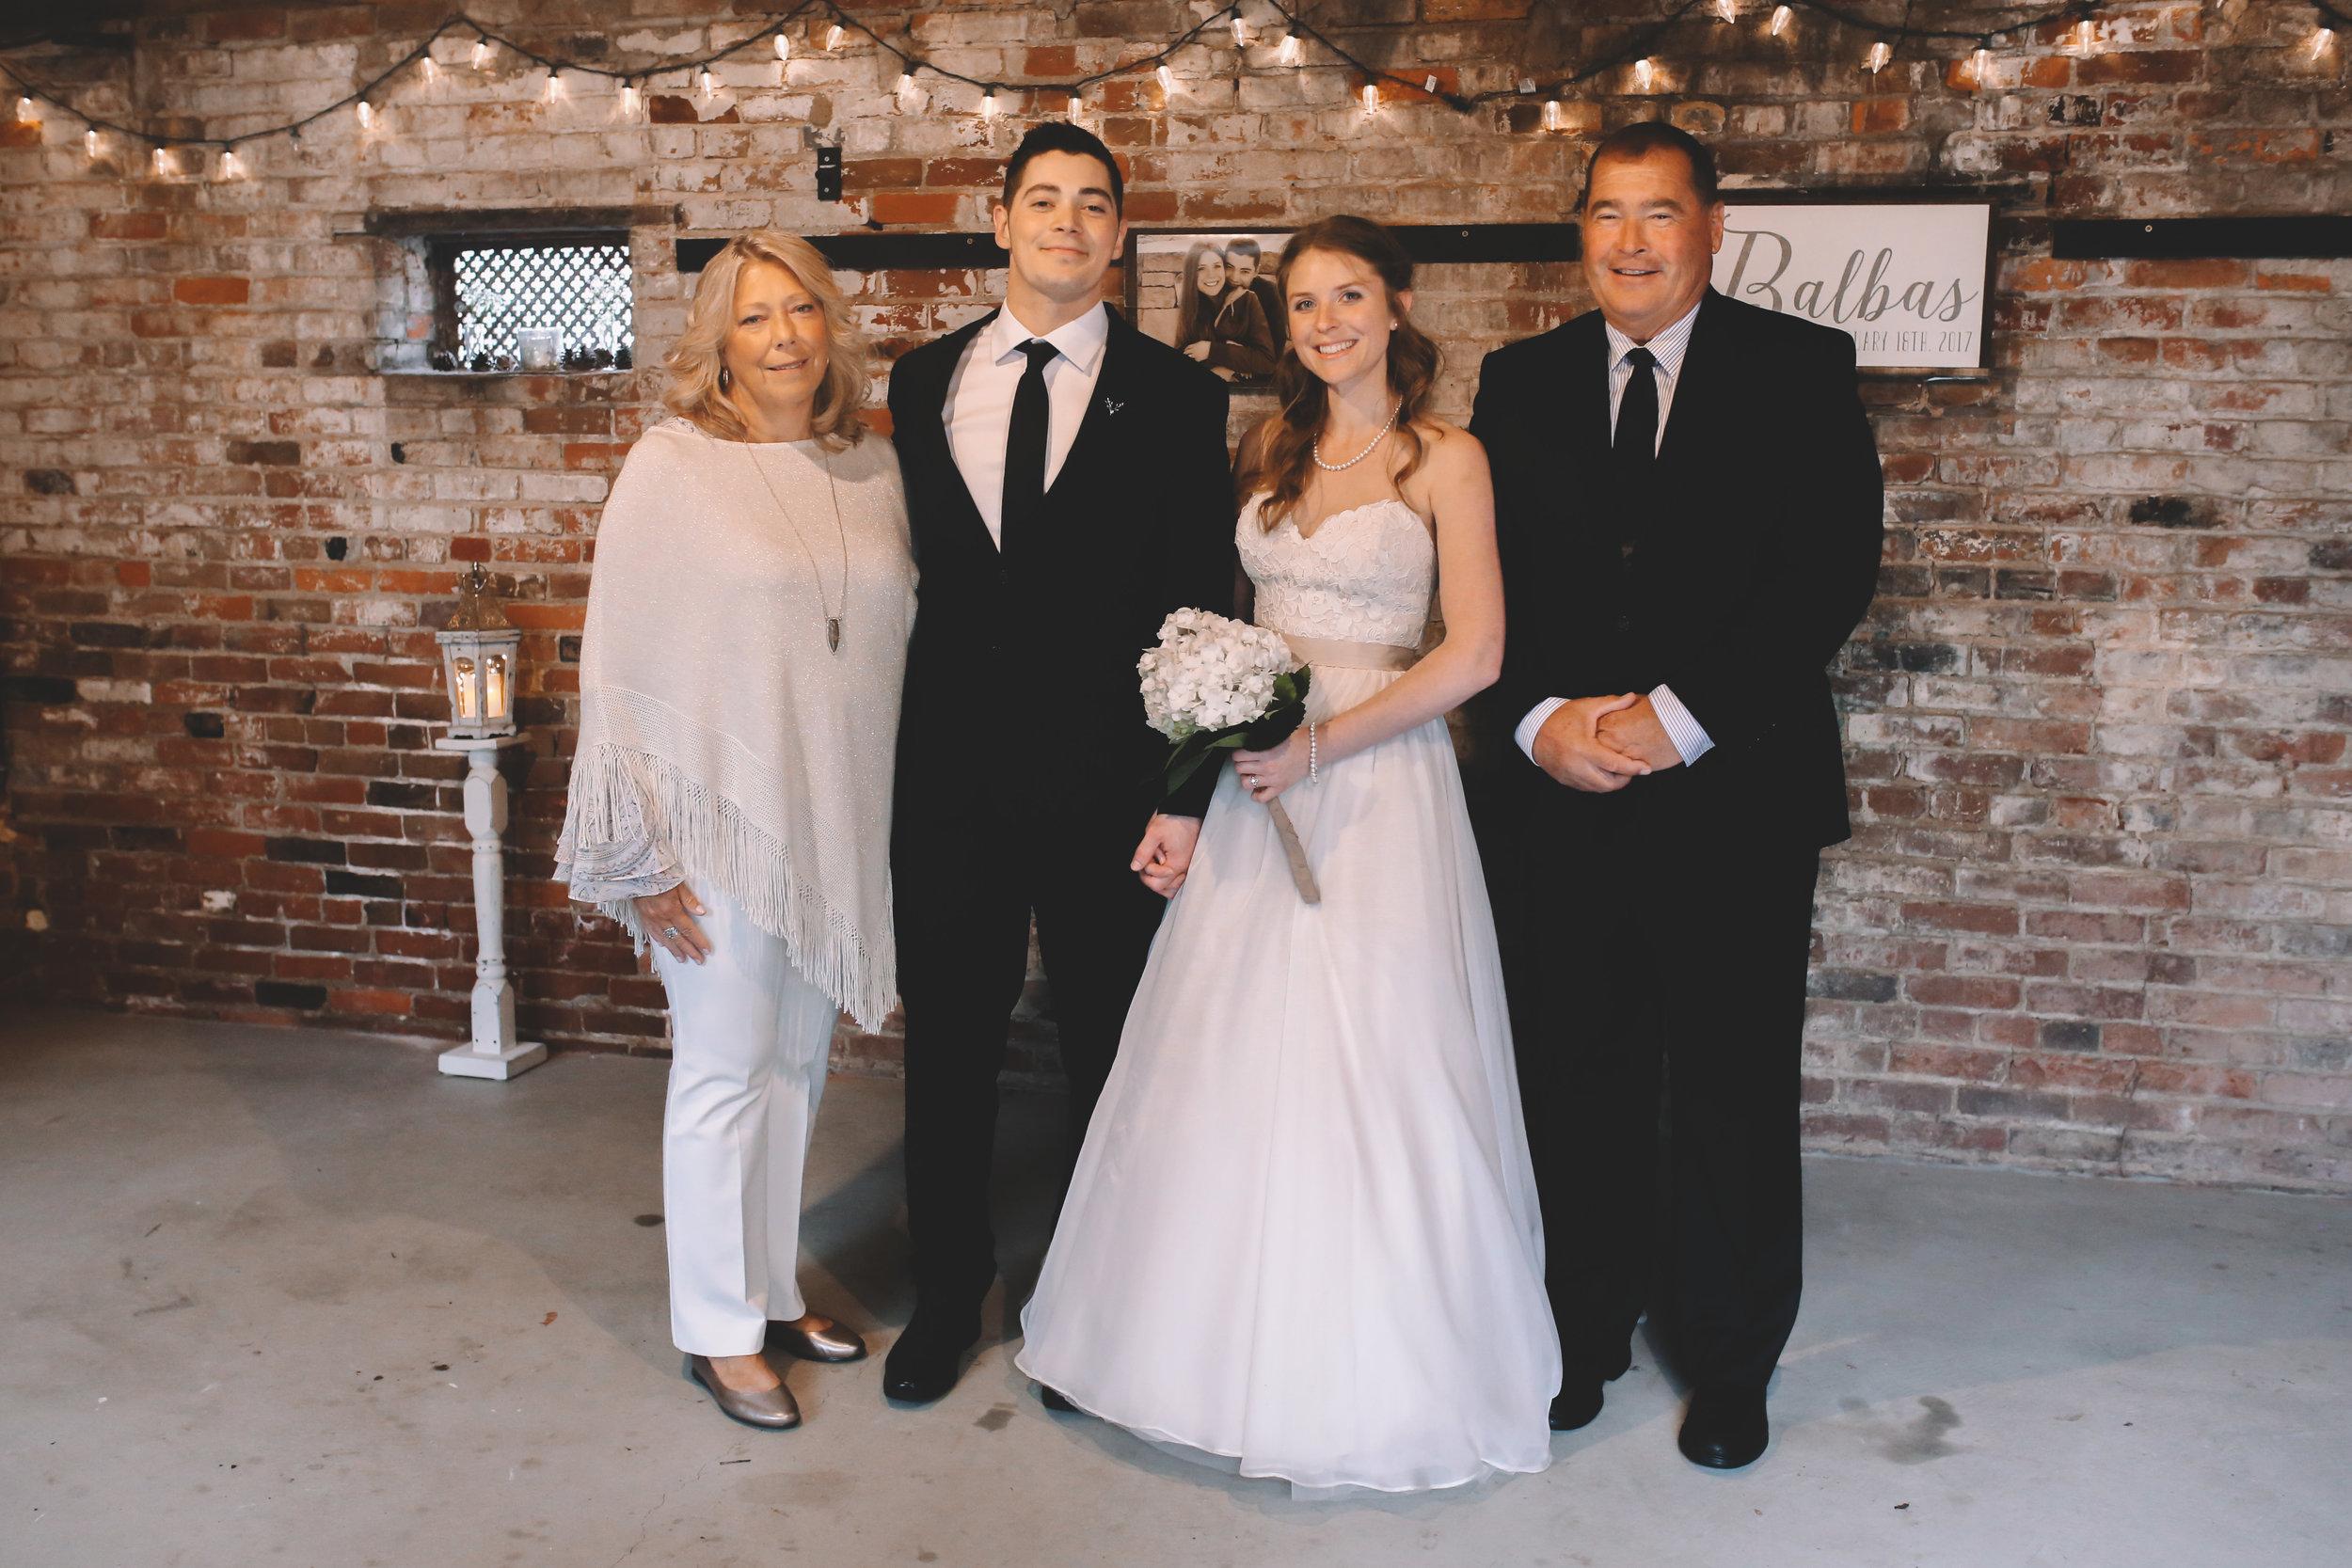 Jake + Brittney Balbas Airbnb Carriage House Wedding Evansville IN (196 of 426).jpg